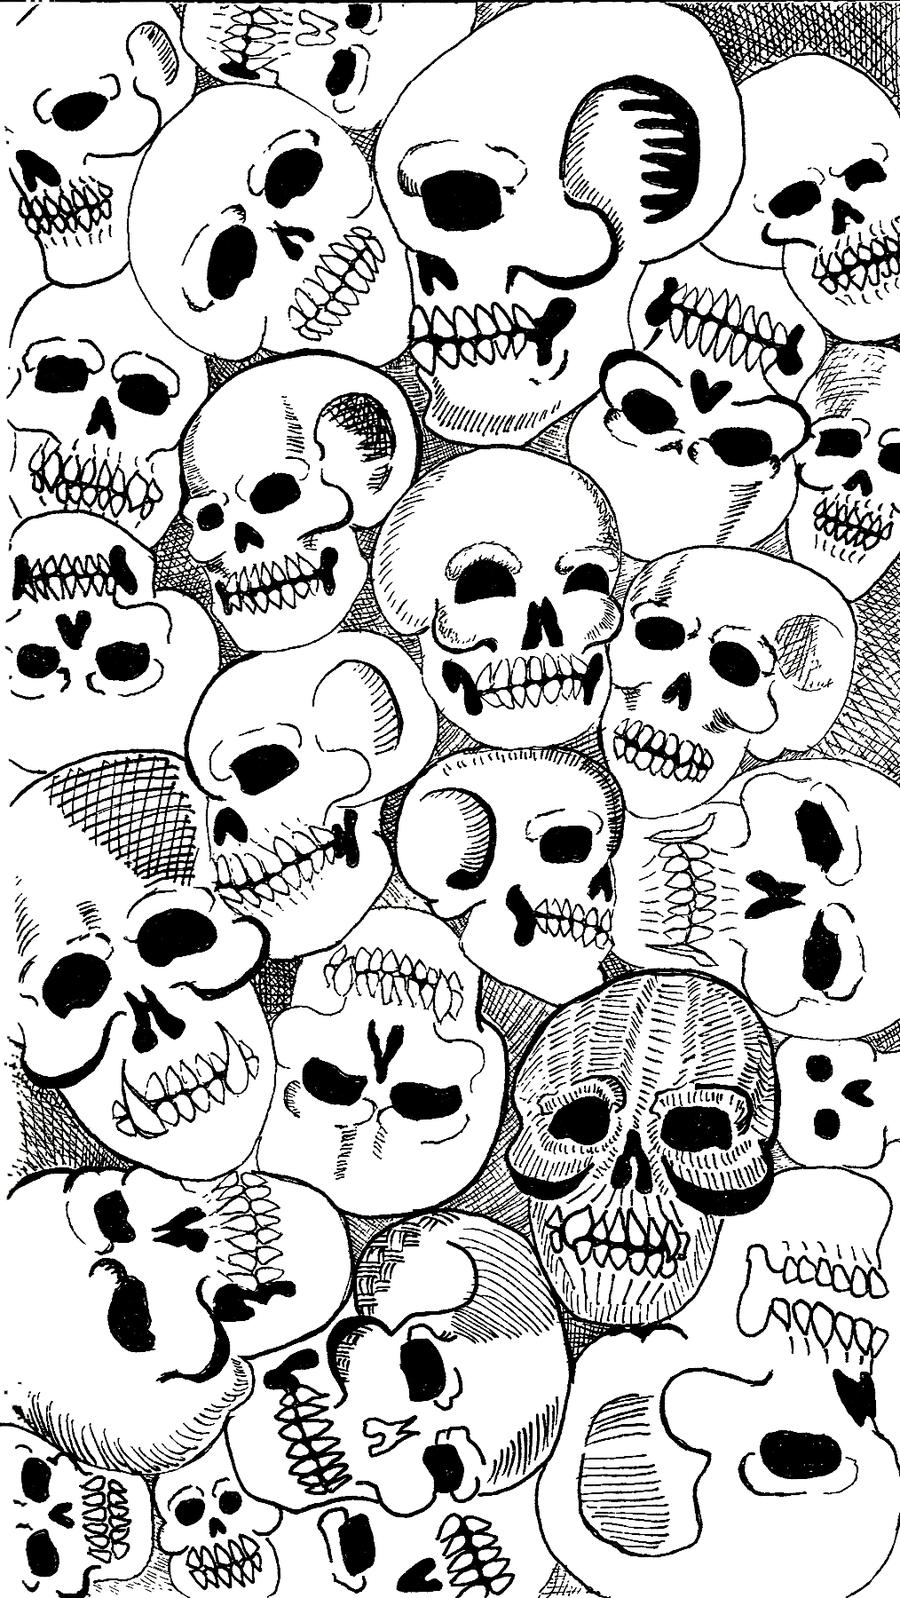 900x1598 Pile O' Skulls By Trombs